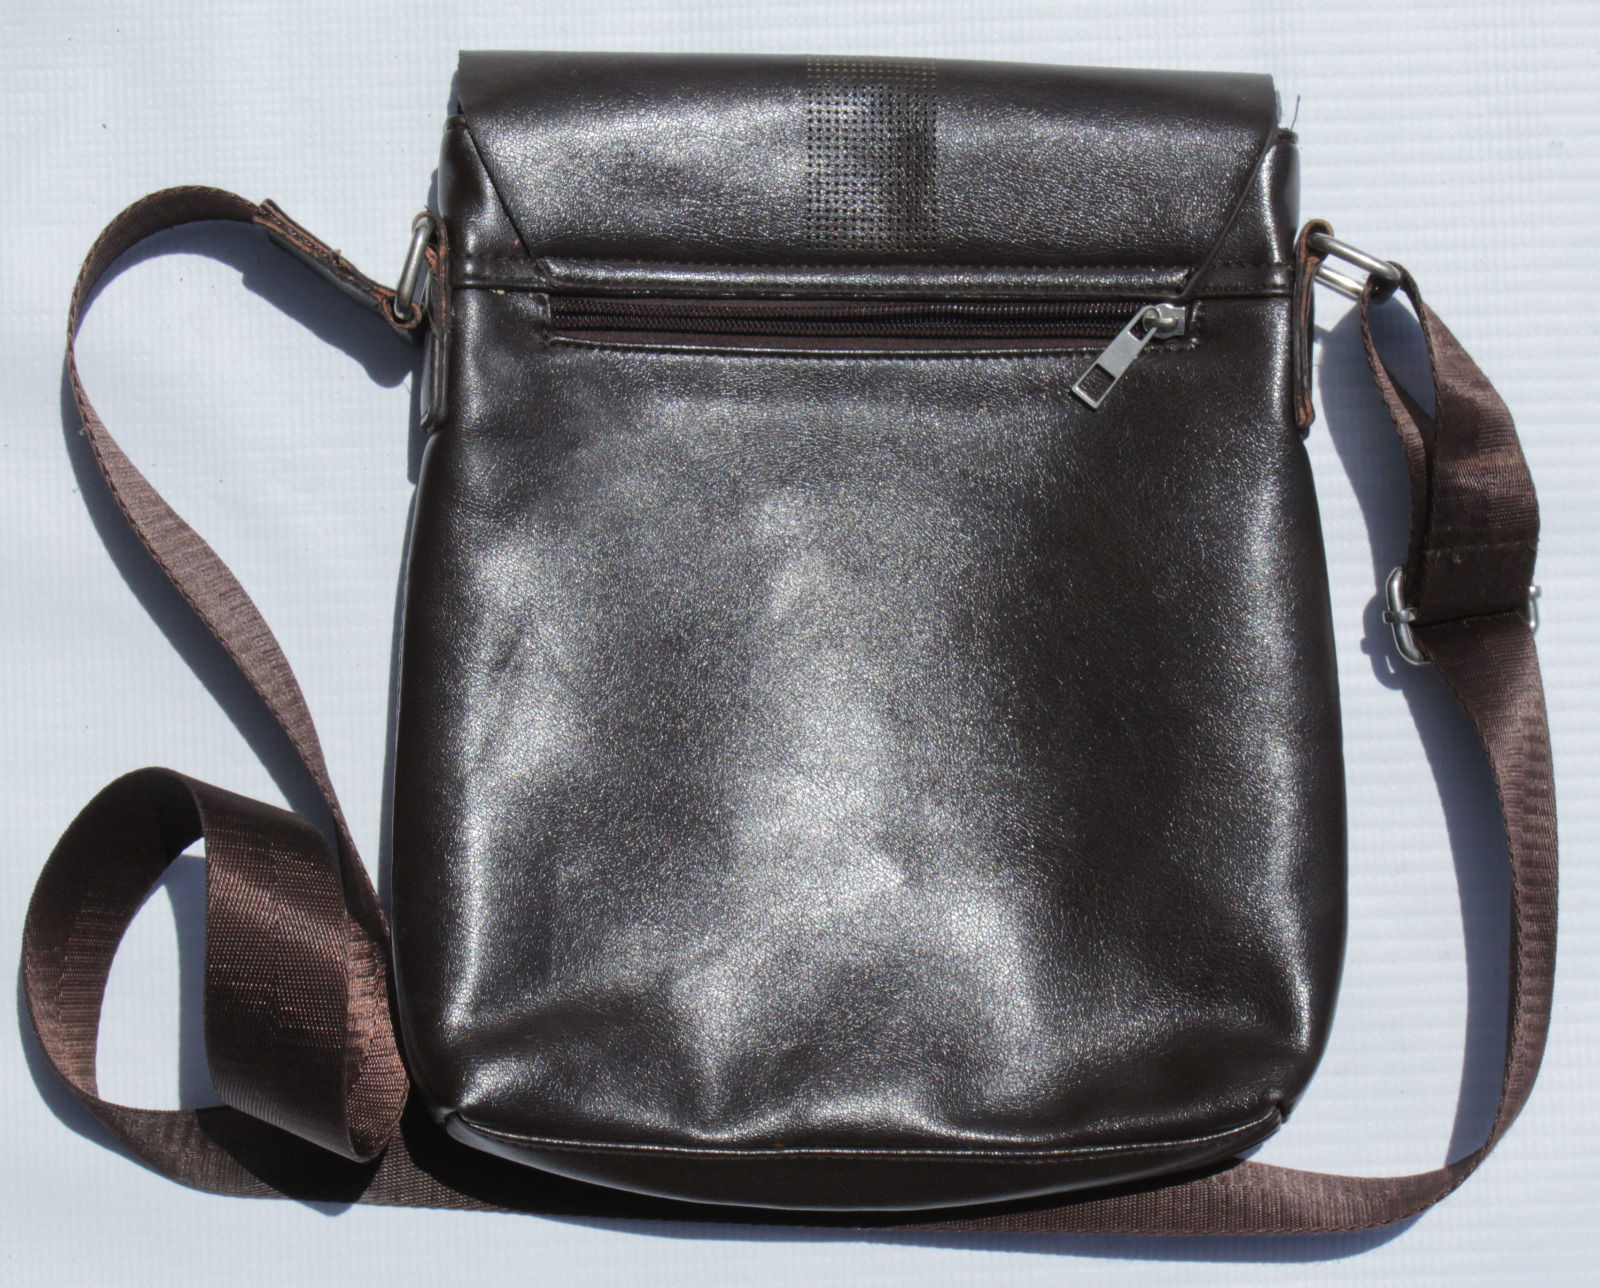 Coco Leather Purse